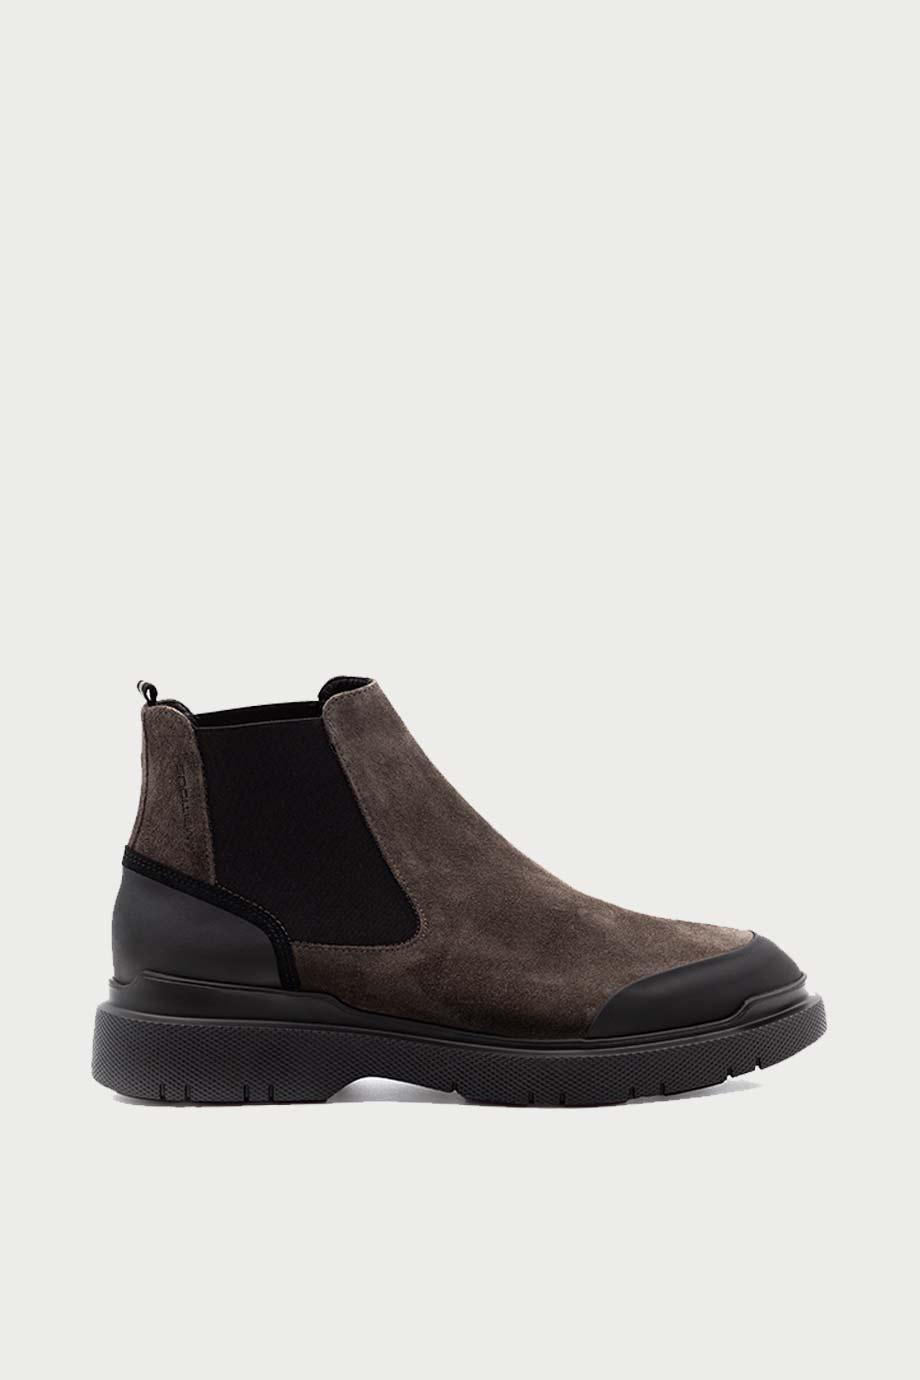 spiridoula metheniti shoes xalkida p 080 186 denis 11881 3748am ambitious